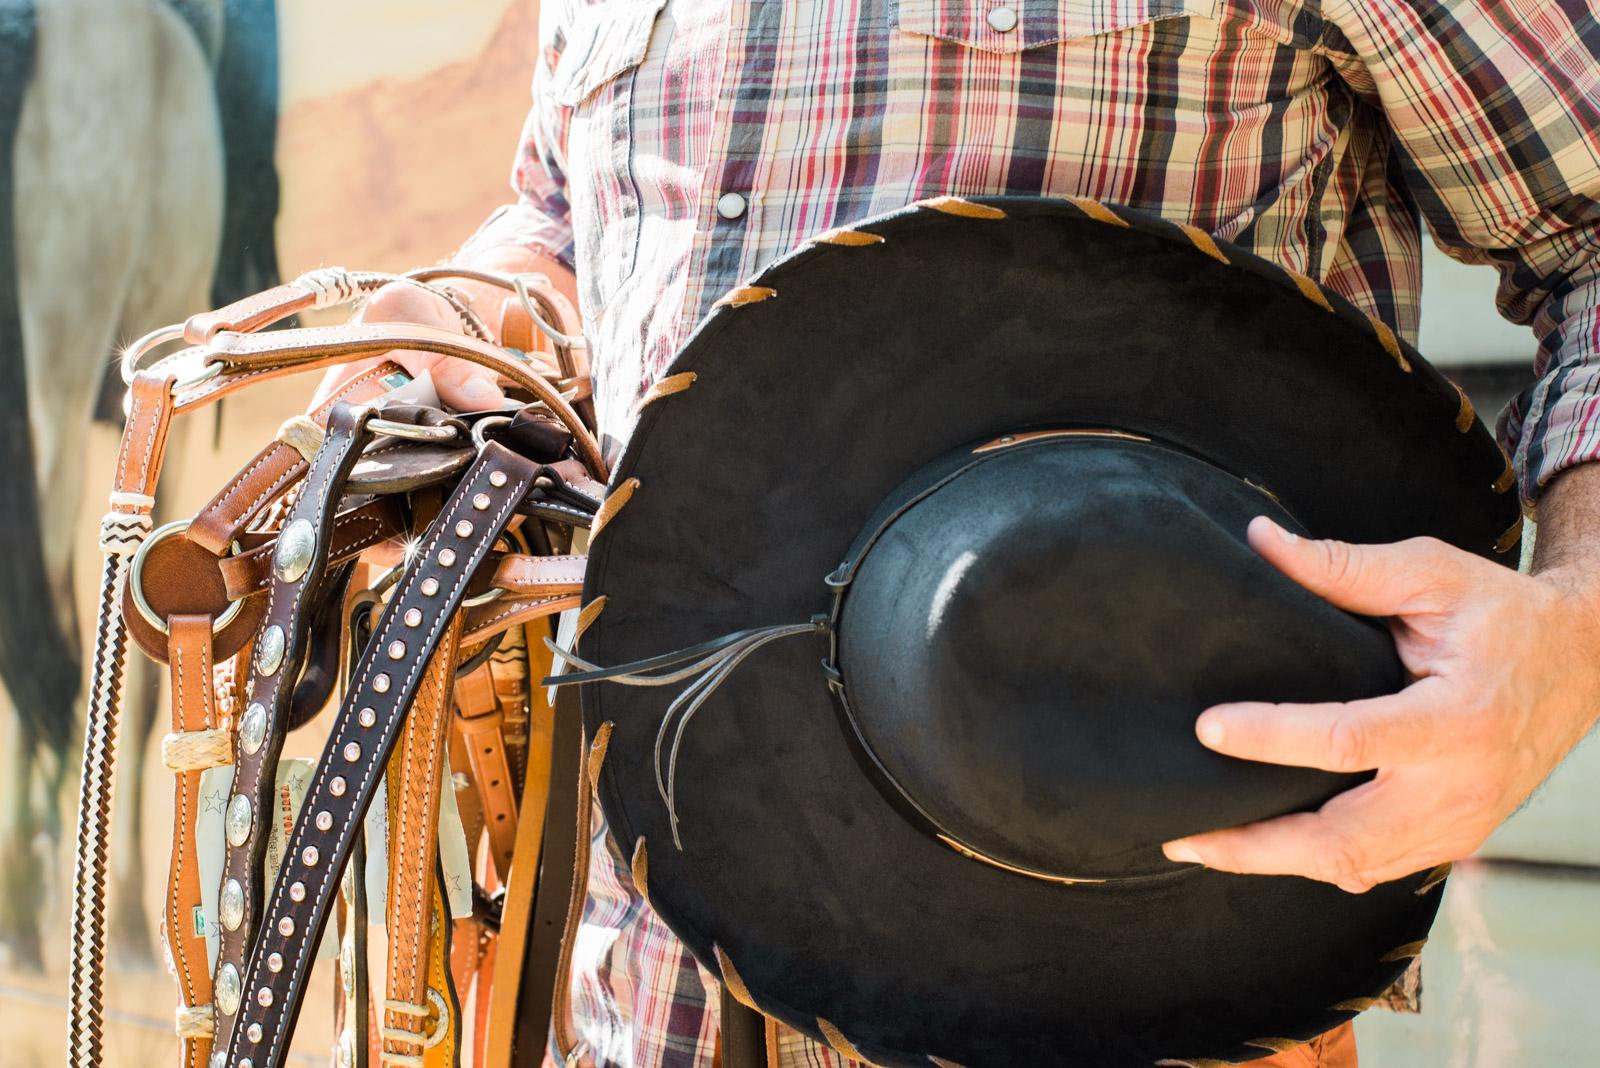 L'Hacienda, produits d'équitation (selles, bottes...)